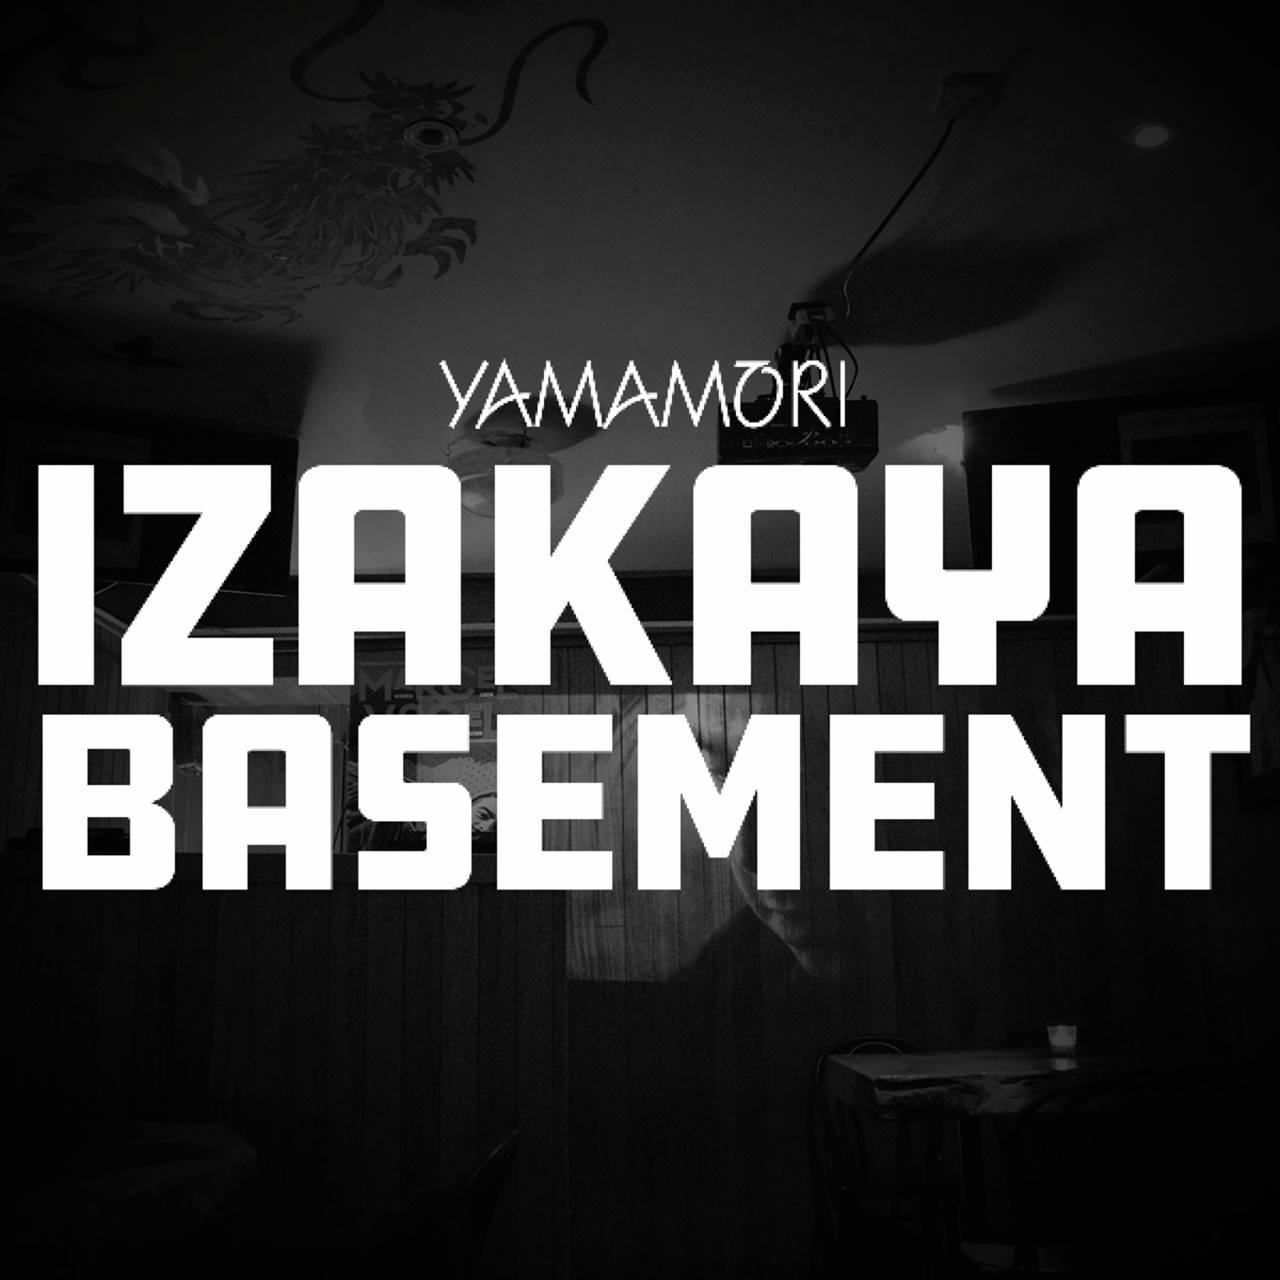 https://yamamori.ie/izakaya-basement?fbclid=IwAR1i3Sm_NUBfse7XllY1P36knwQbaOi7-PjEktnIAzuDXX7eyZLl3G0SjRI